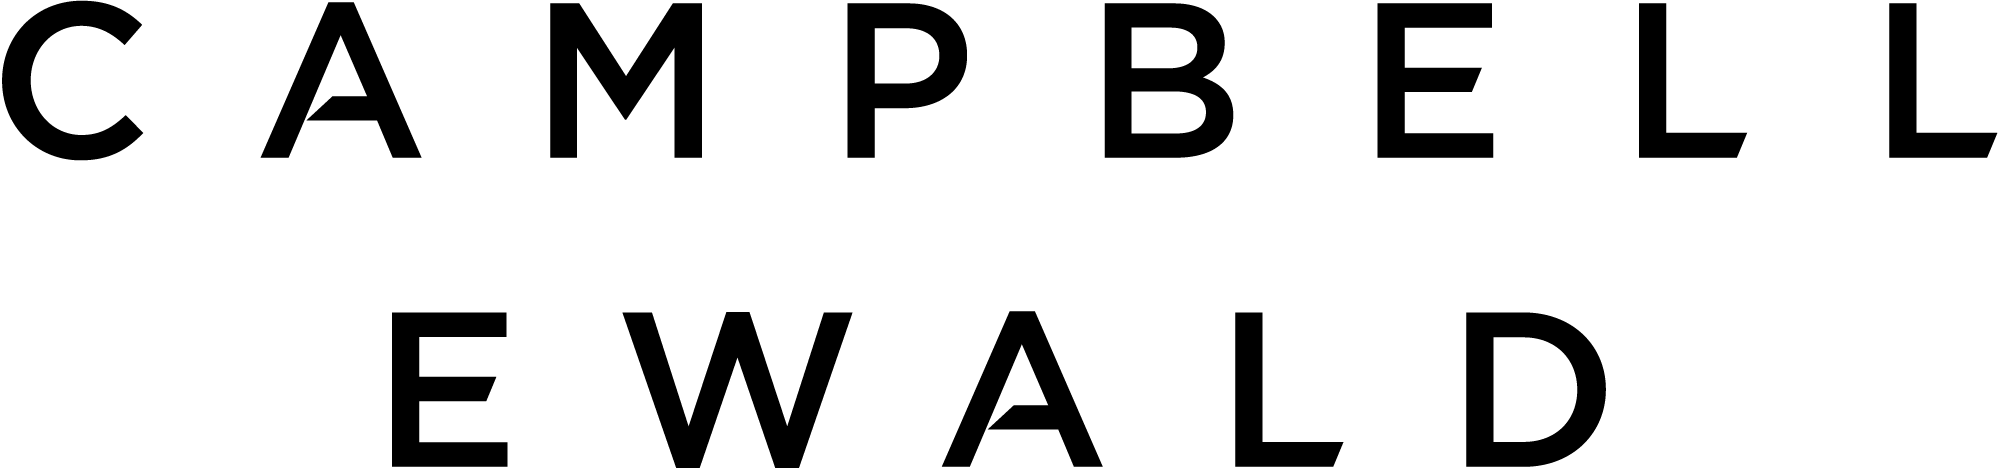 campbell_ewald_logo.png